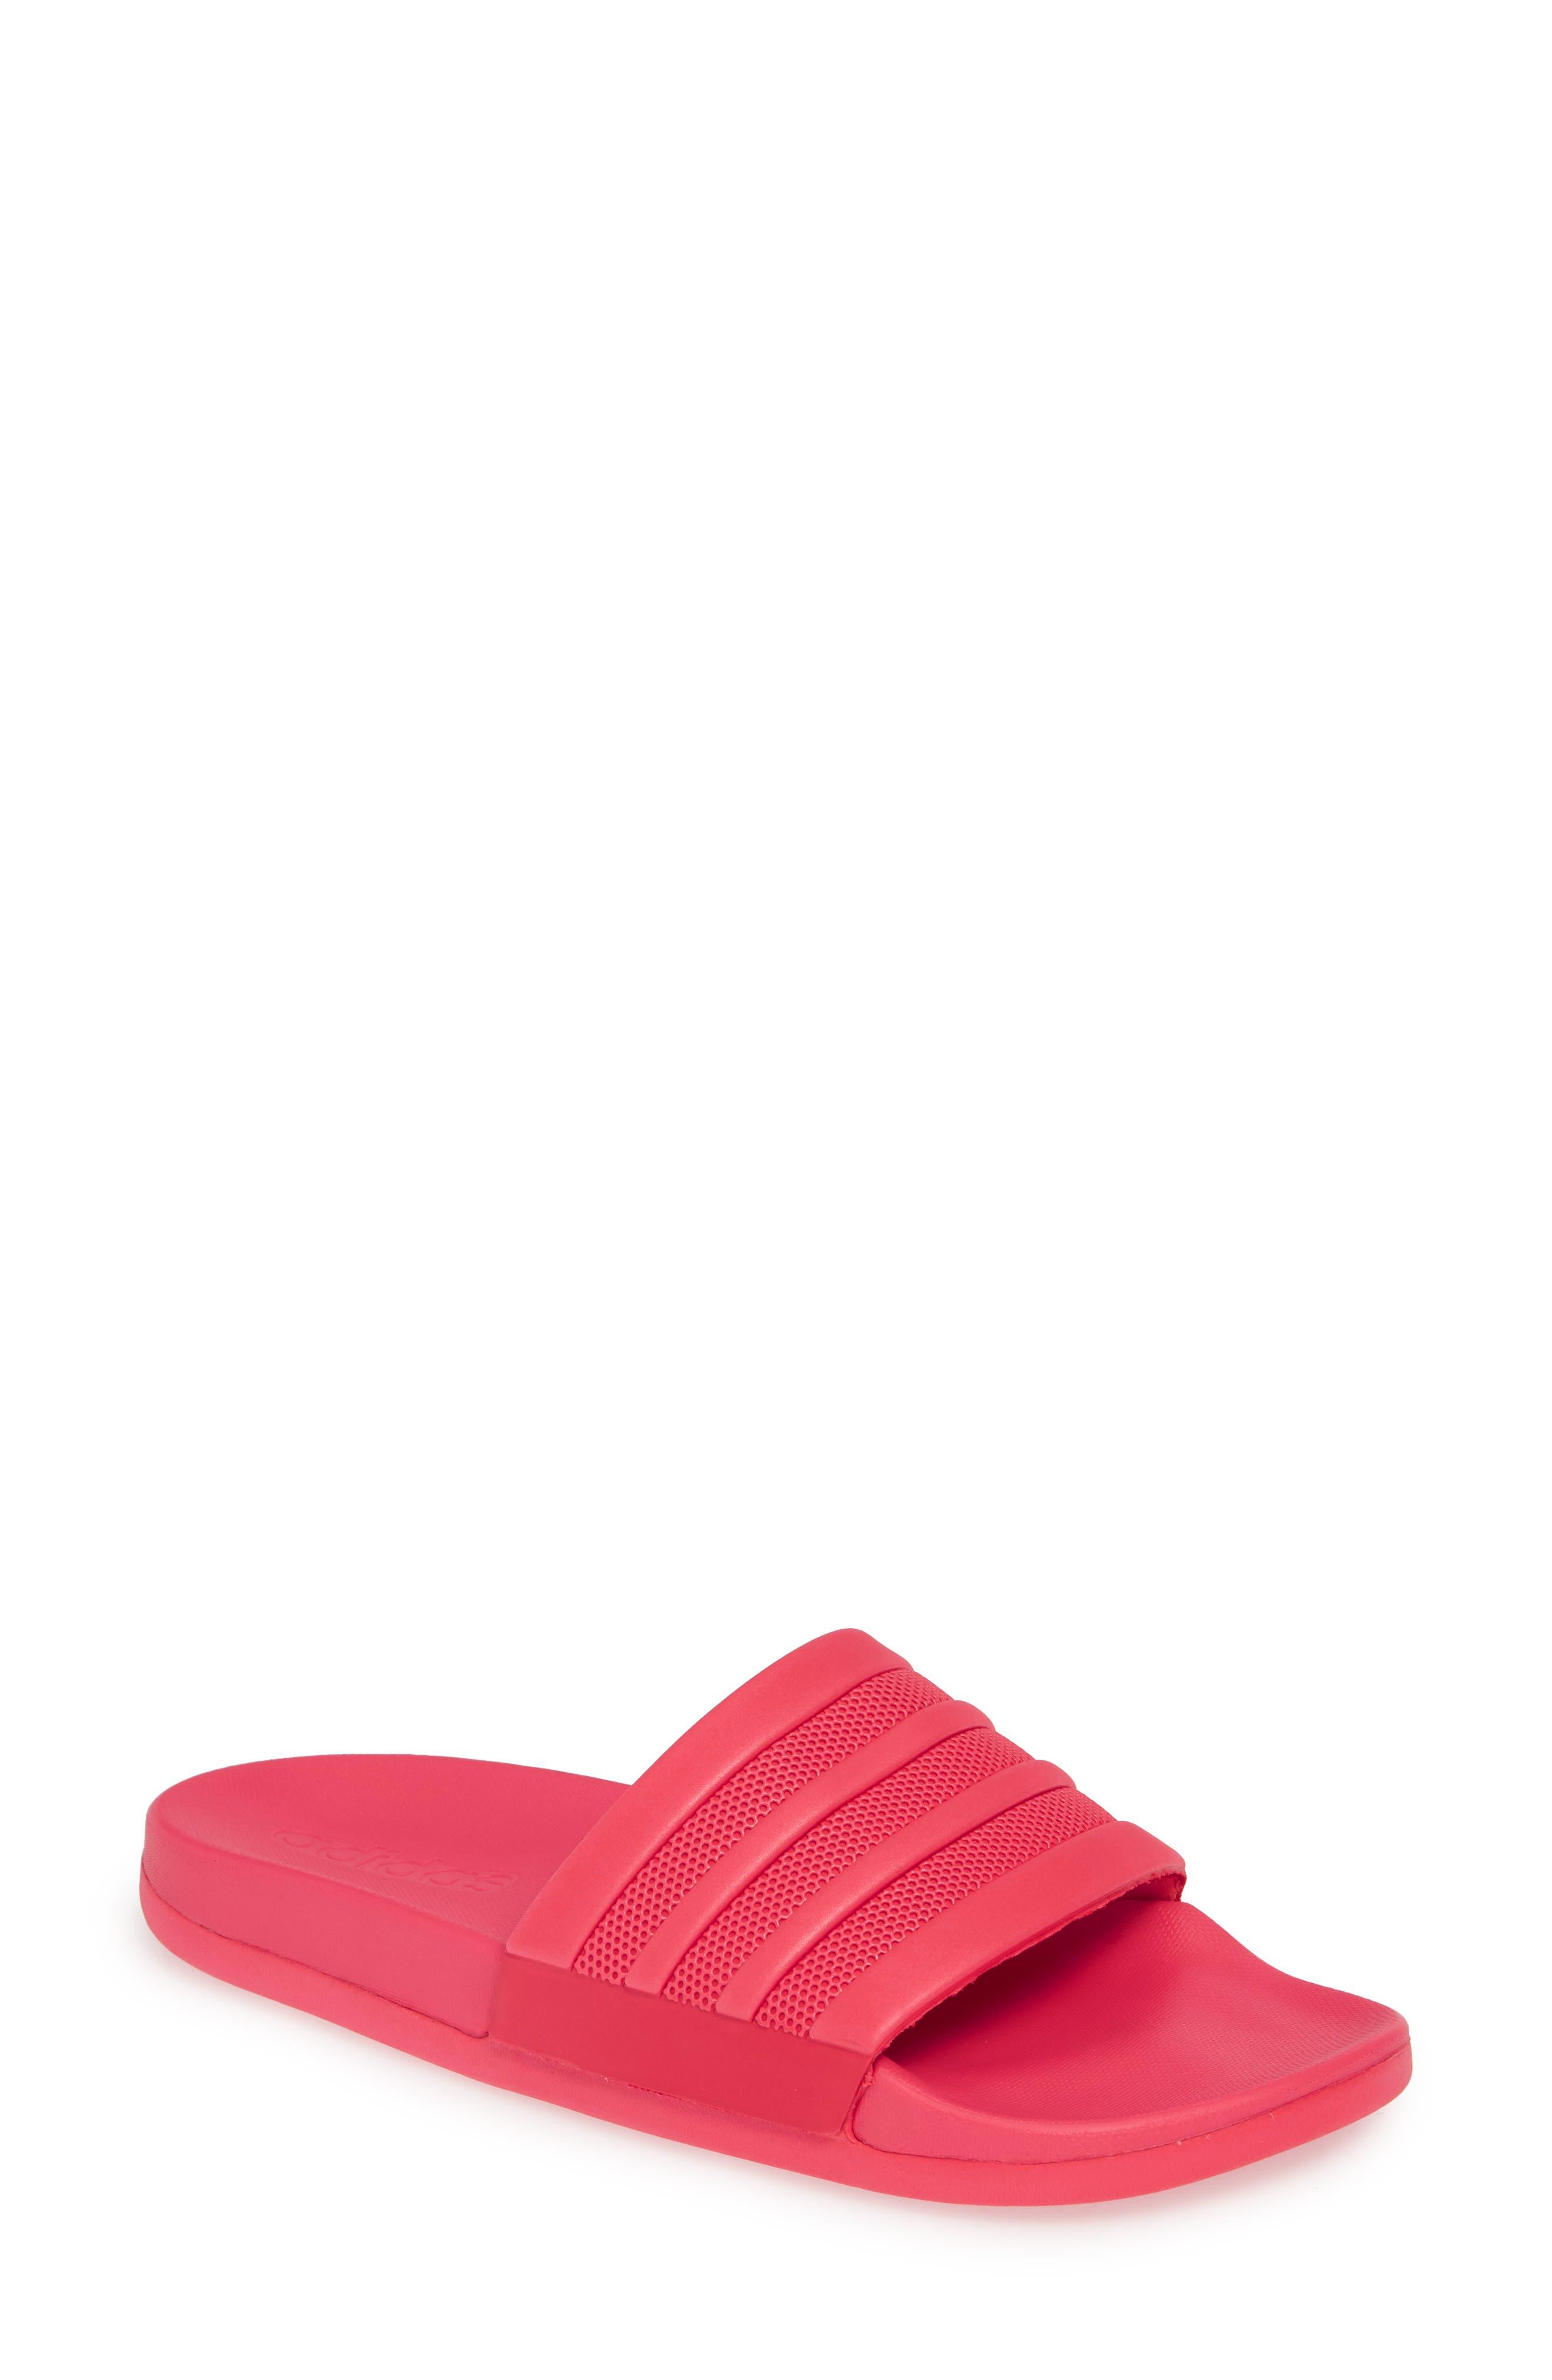 Adidas Adilette Comfort Sport Slide, / 4 Men